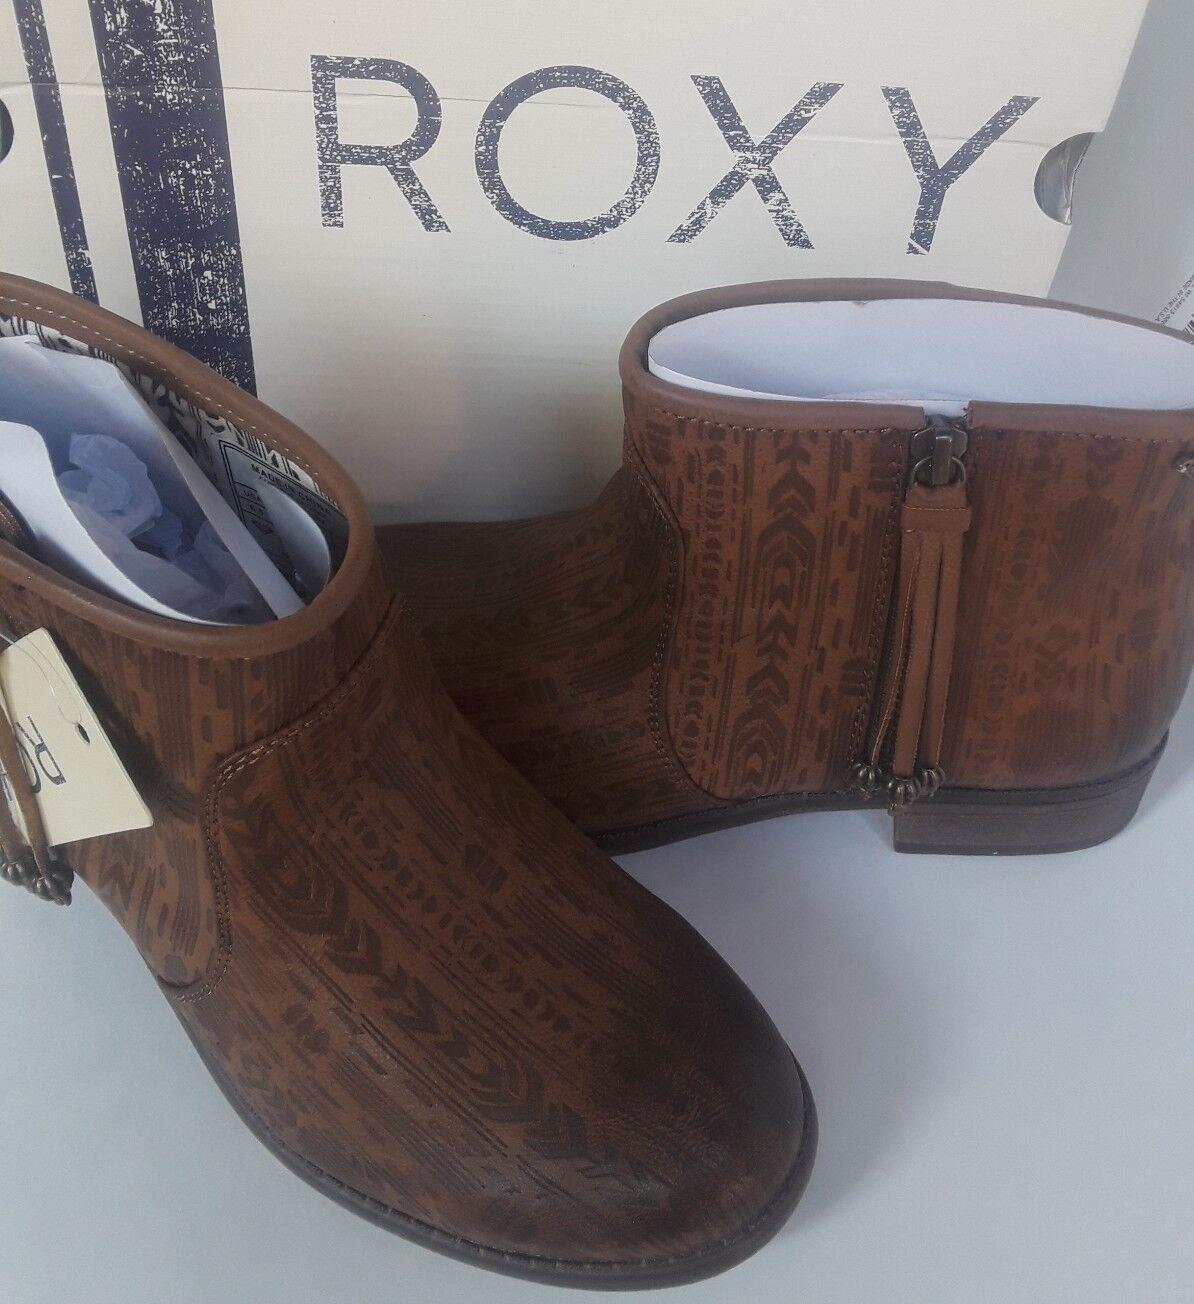 ROXY bottes femmes 6.5 Neuf avec étiquettes